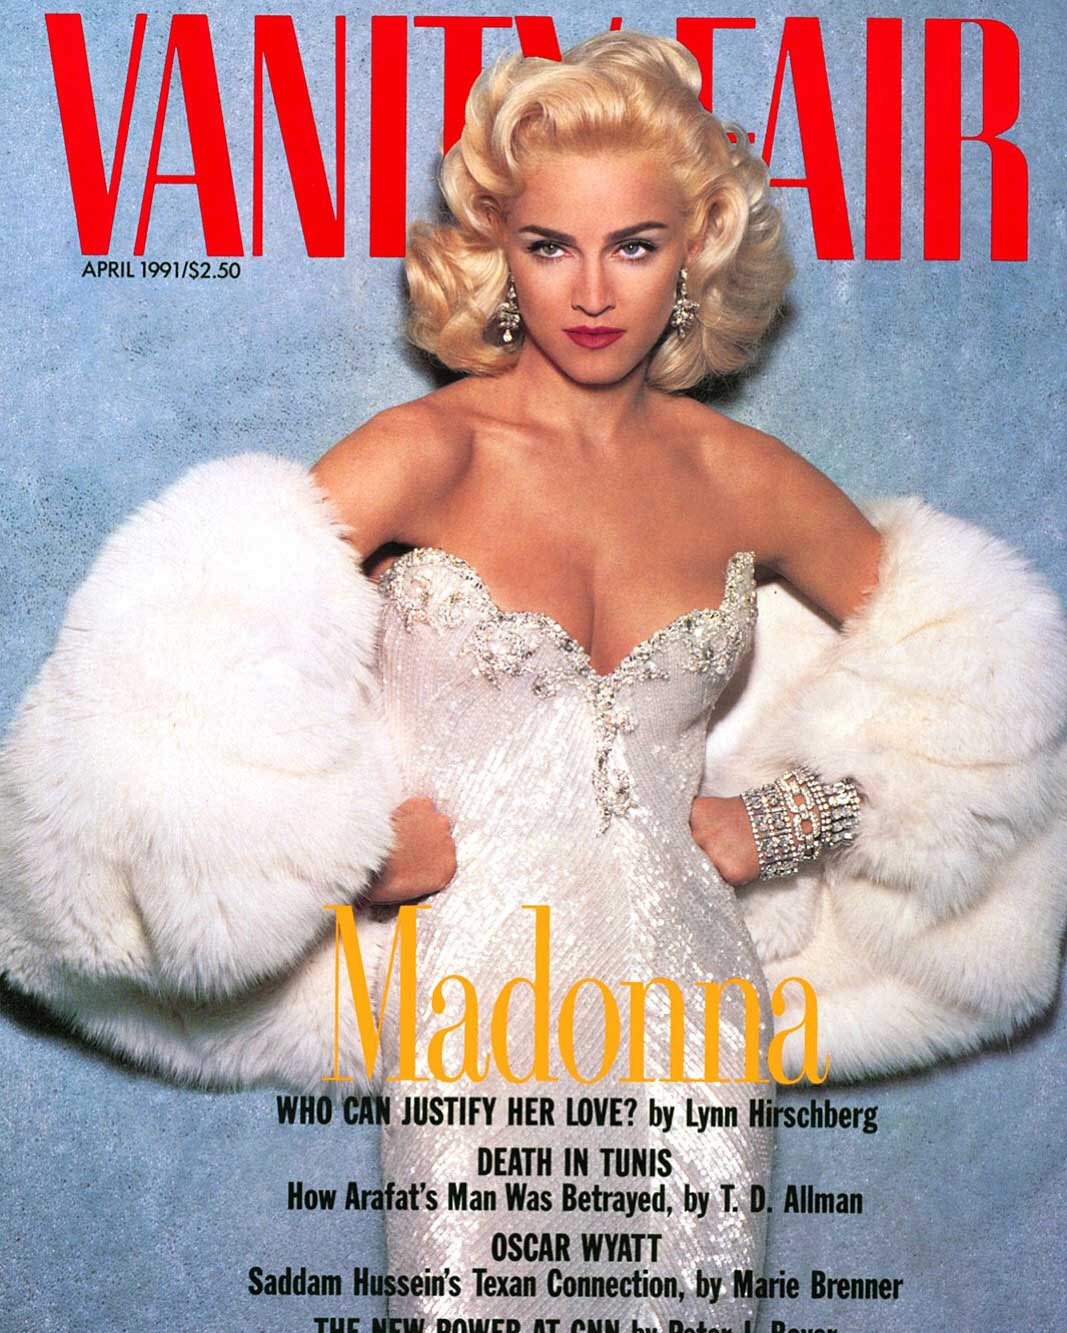 Vanity Fair, Madonna